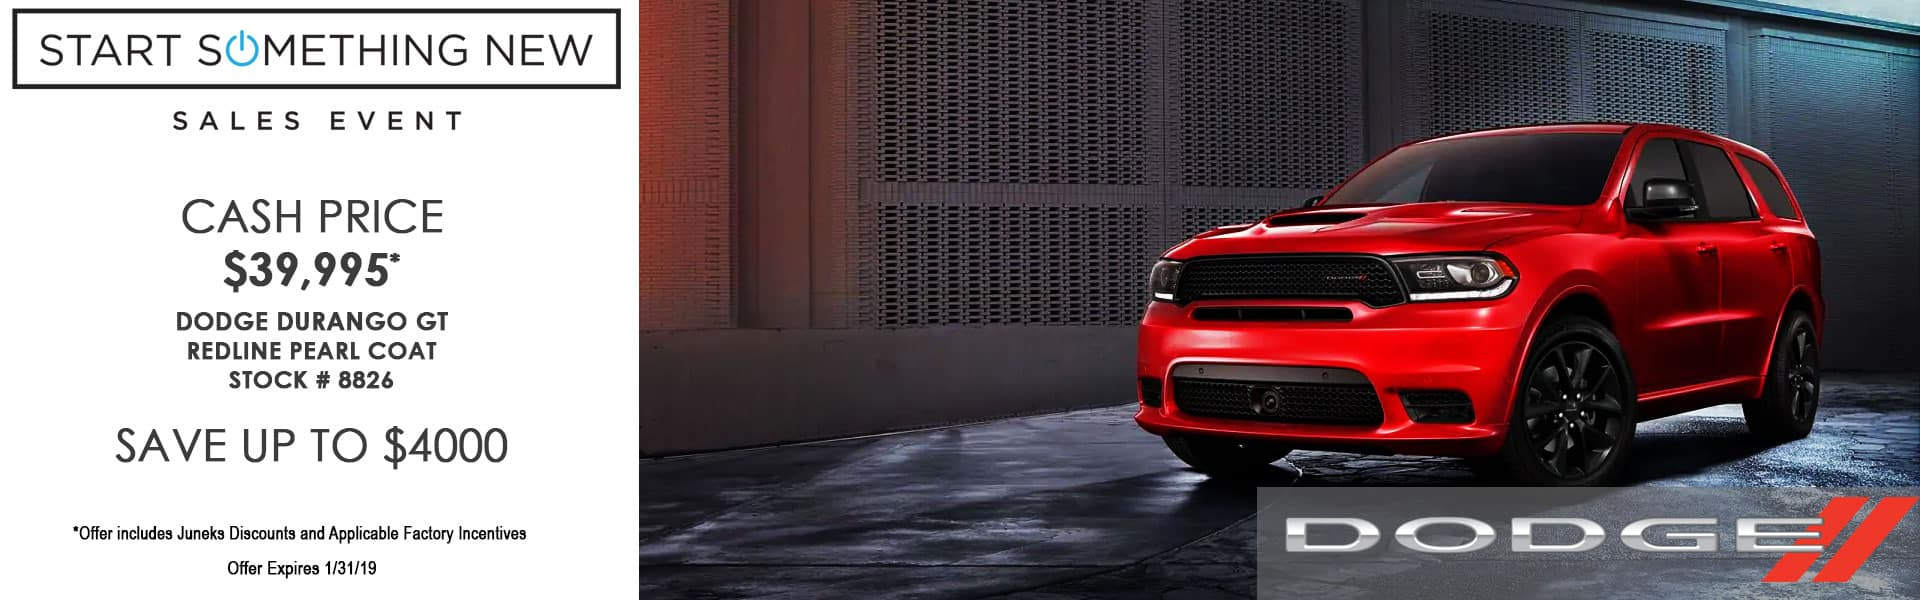 Dodge Durango GT